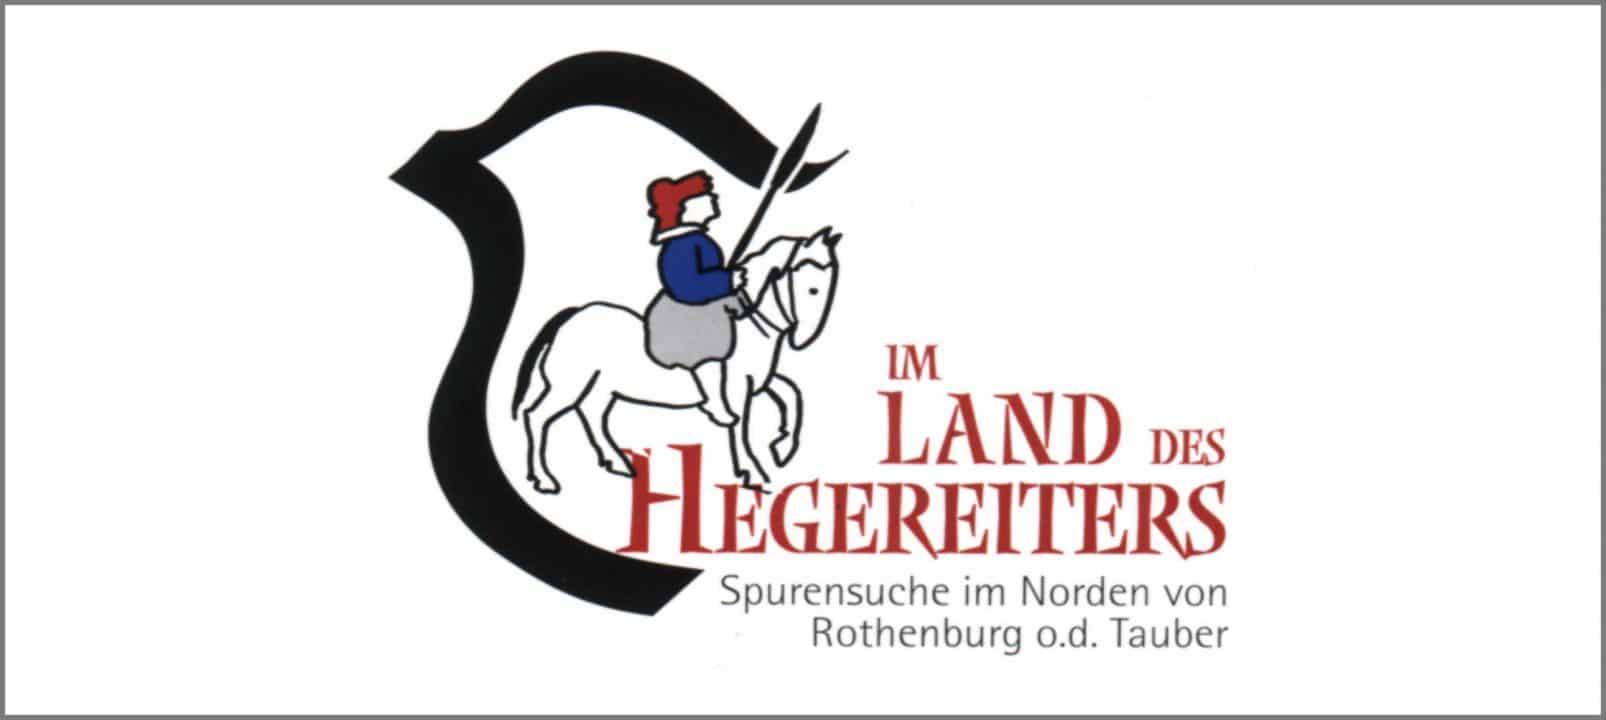 logo-hegereiter_rand